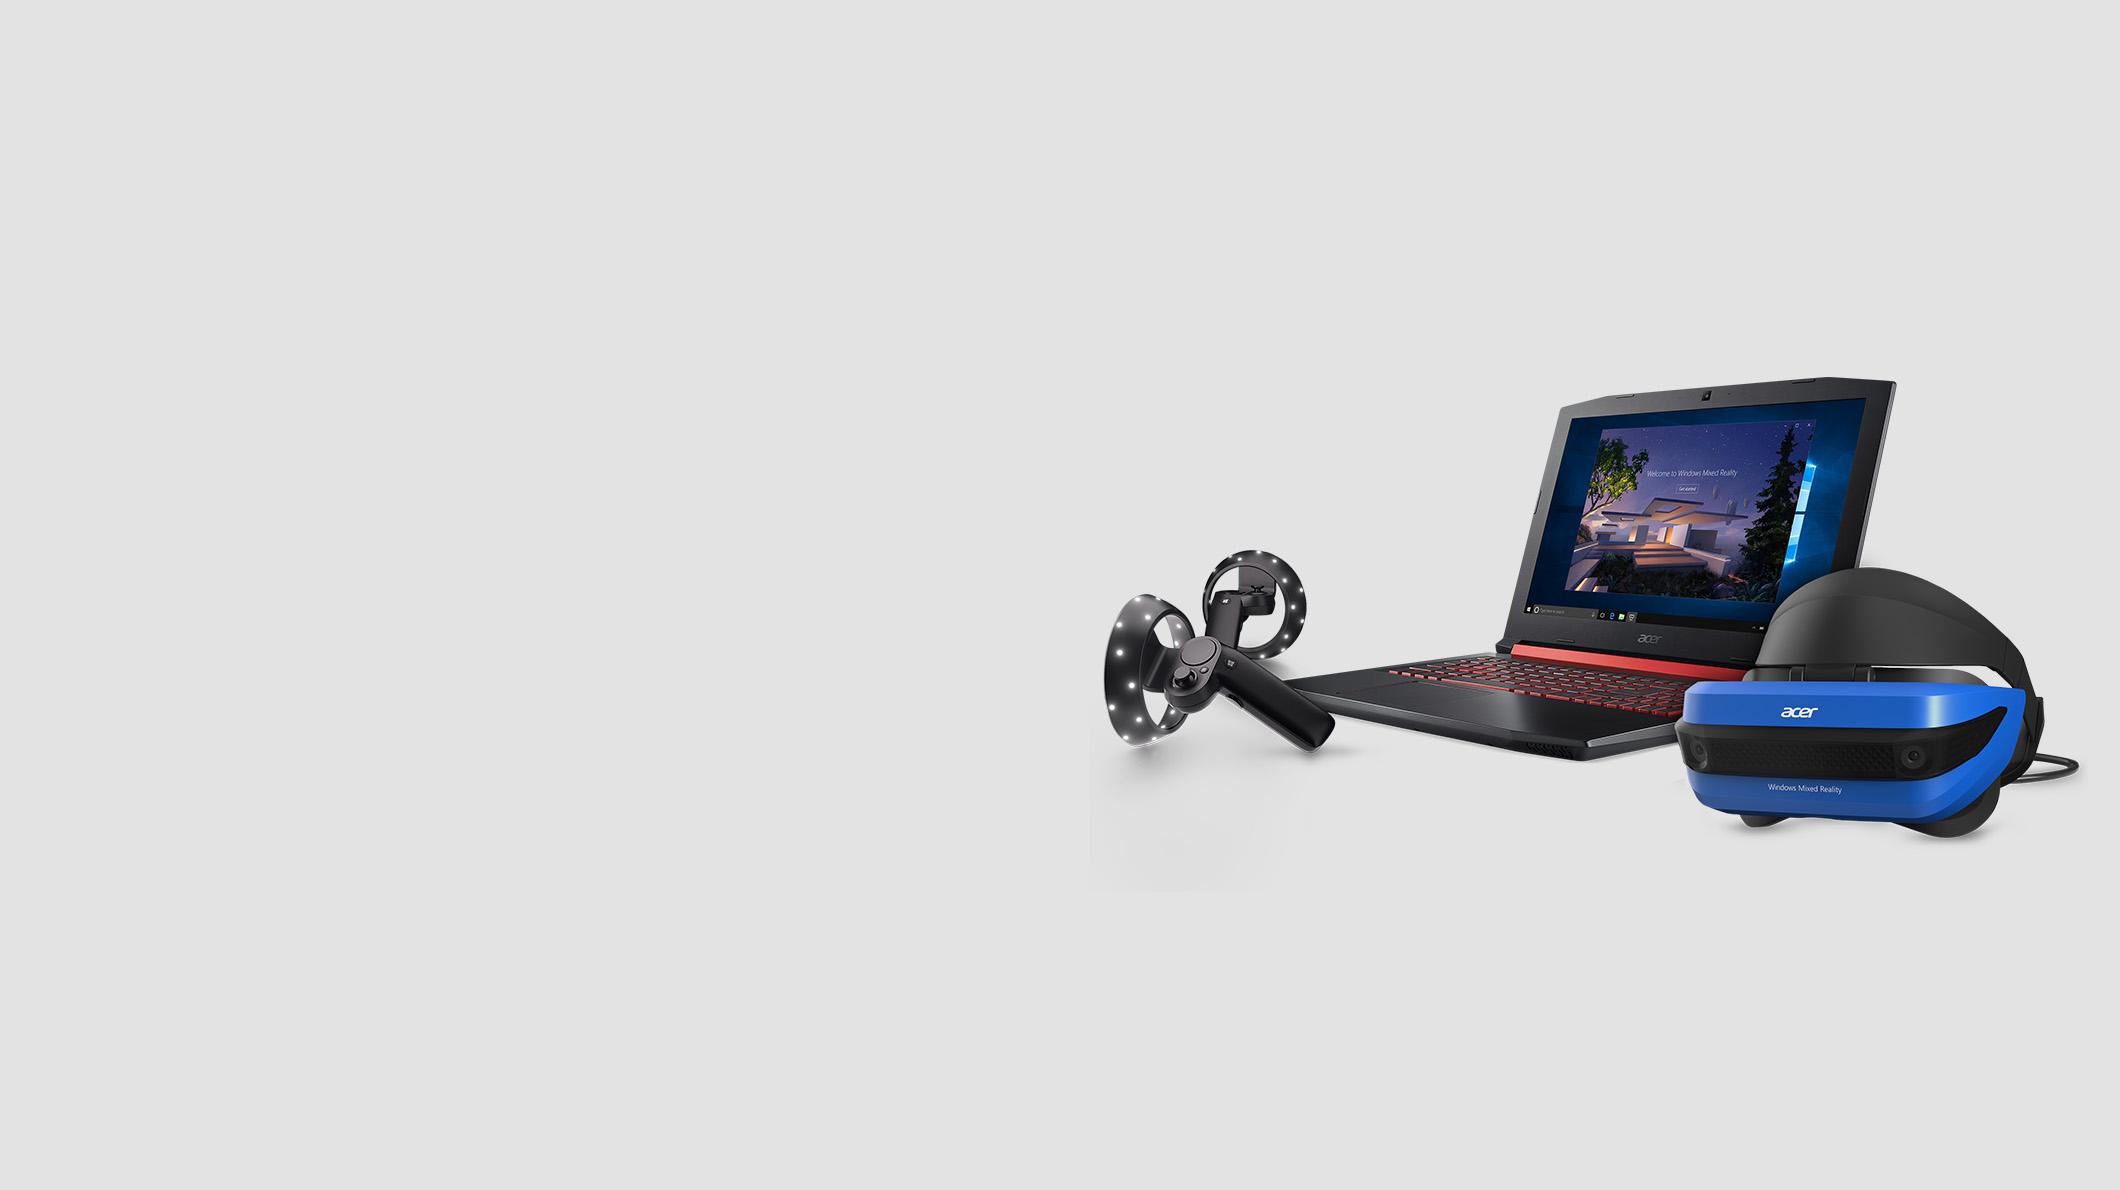 WMR Acer PC headset controller bundle